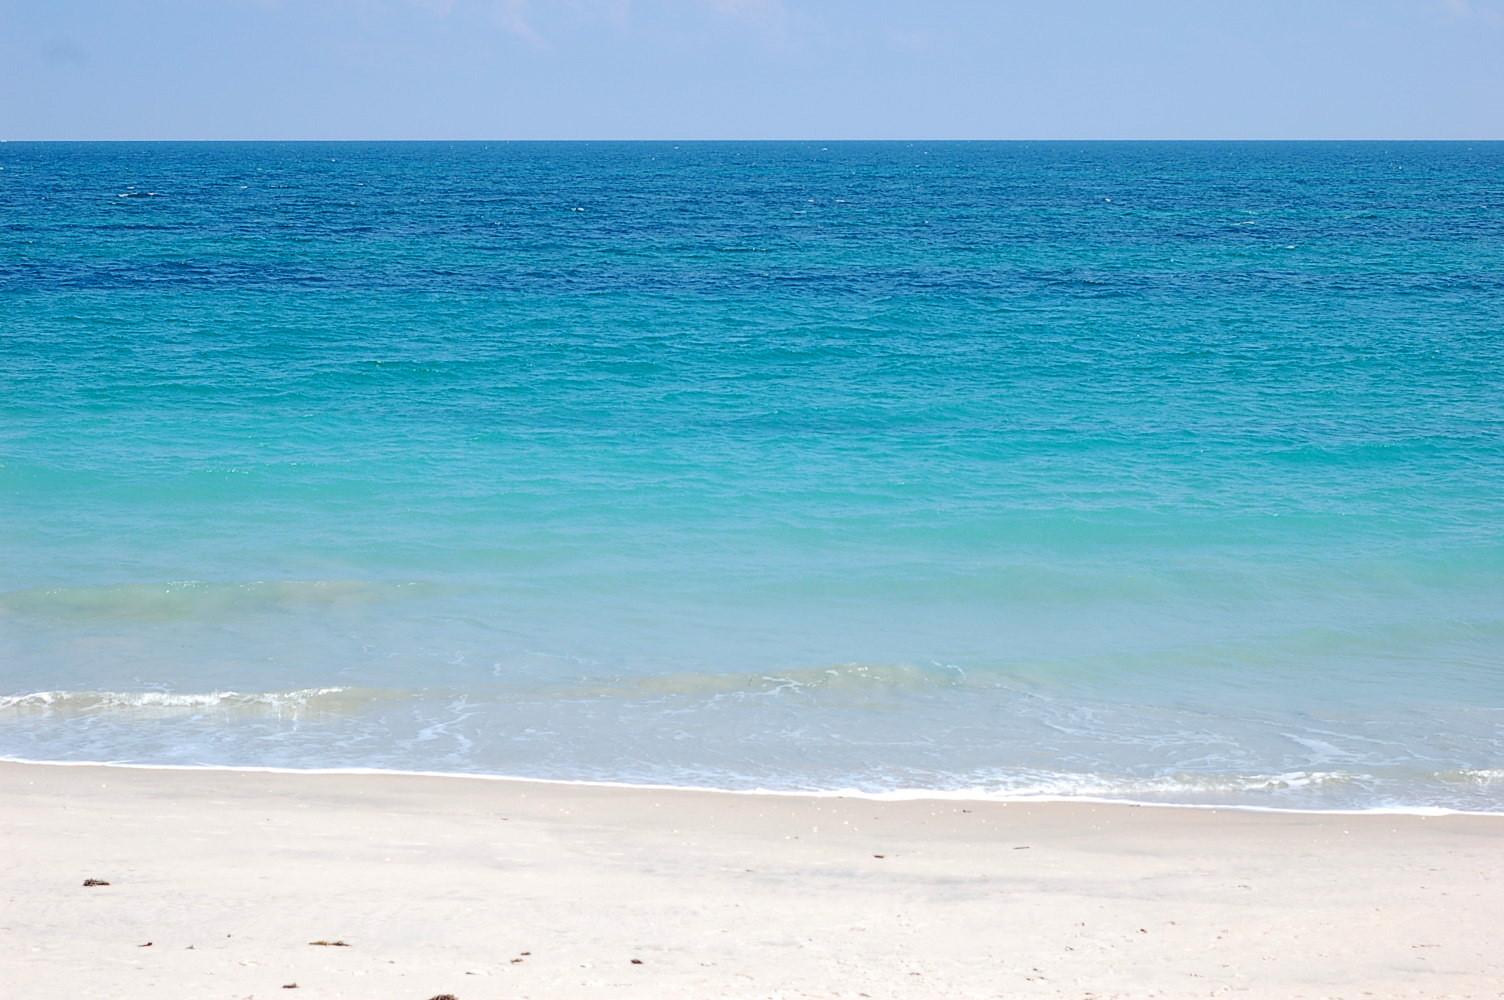 Wallpaper Clearwater Fl: Clearwater Beach, Florida